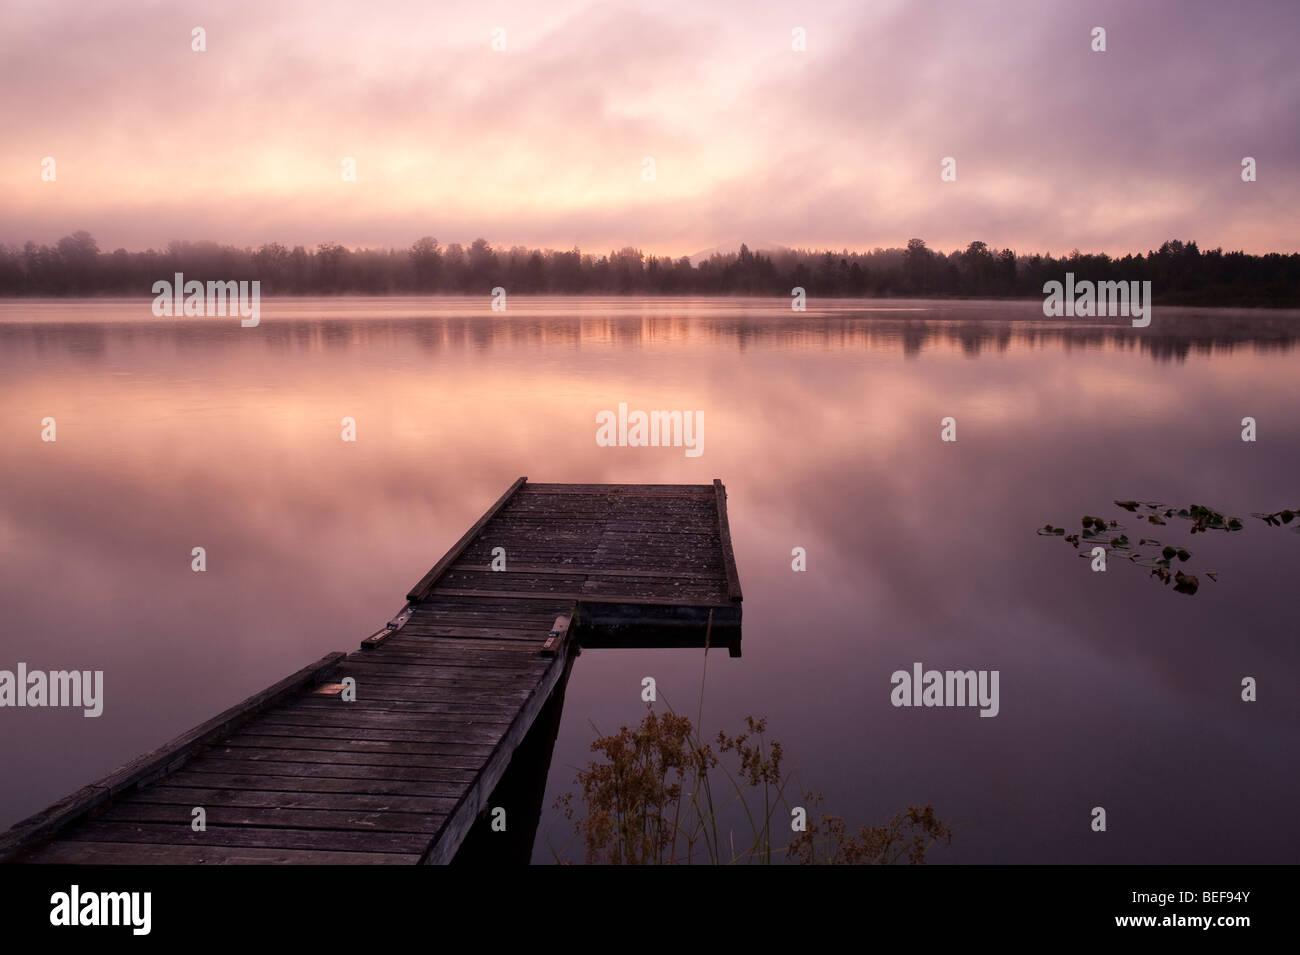 Lake Cassidy sunrise in fog with dock - Stock Image